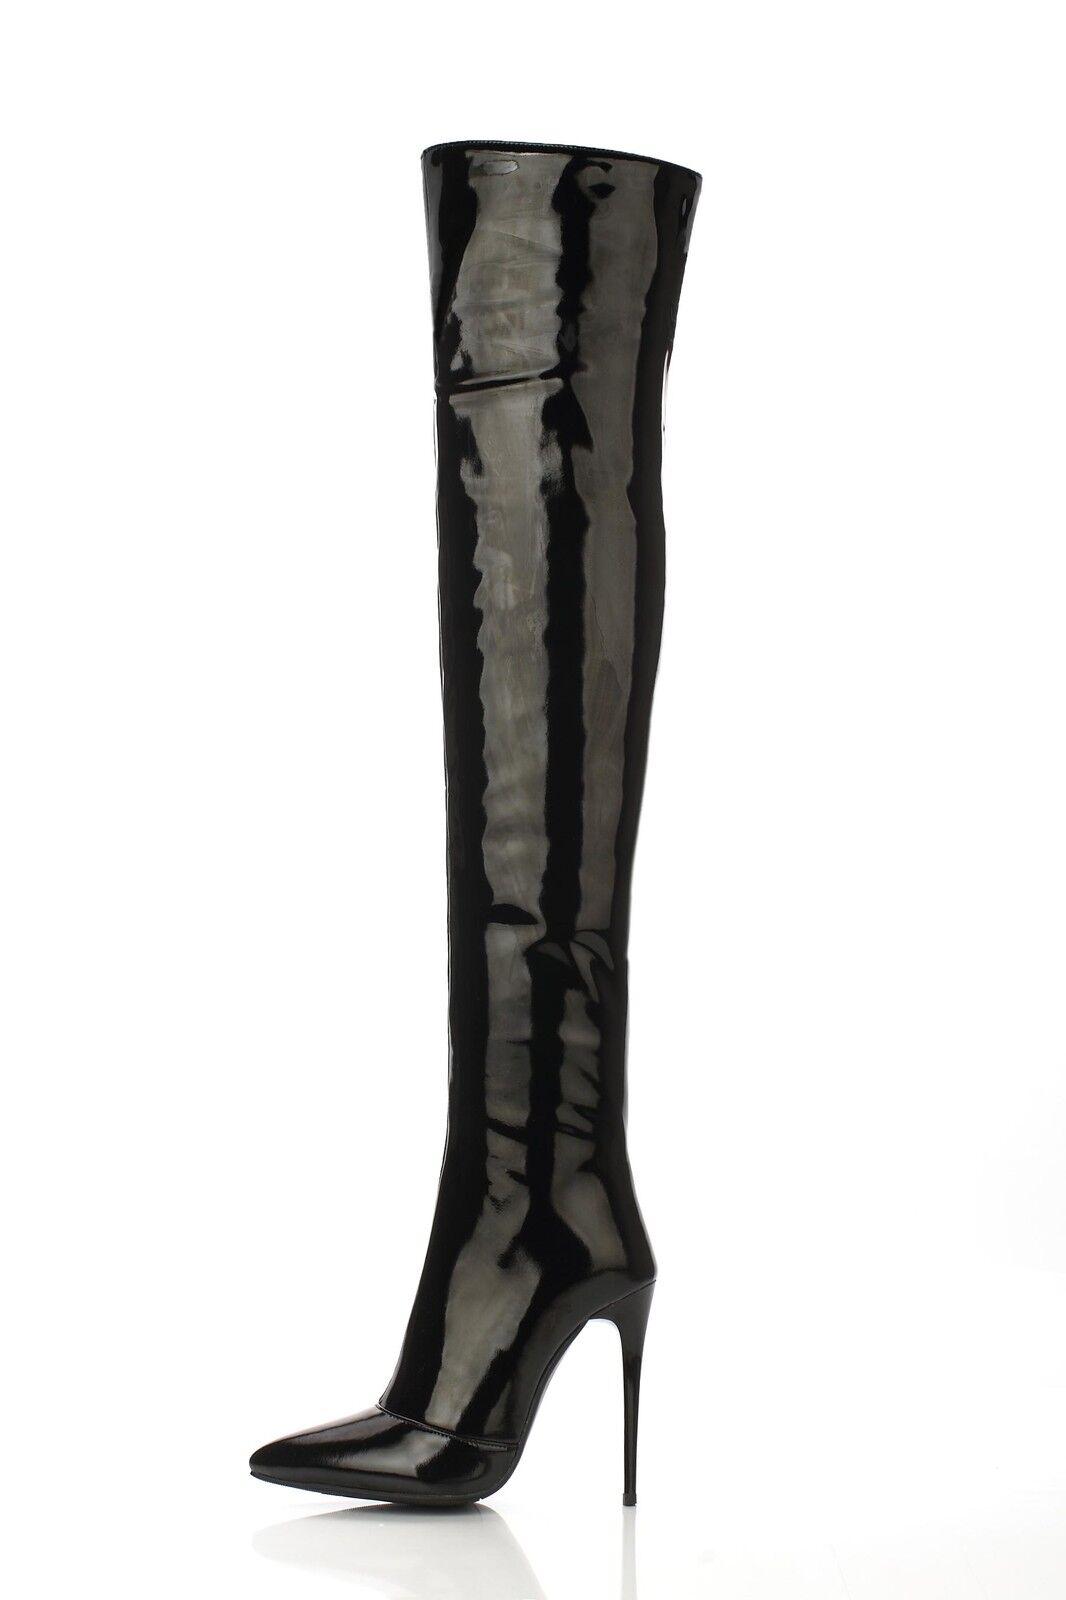 Damenschuhe Stiefel Hoher Stiletto Lackleder Overknee Reißverschluss Gr.34-43